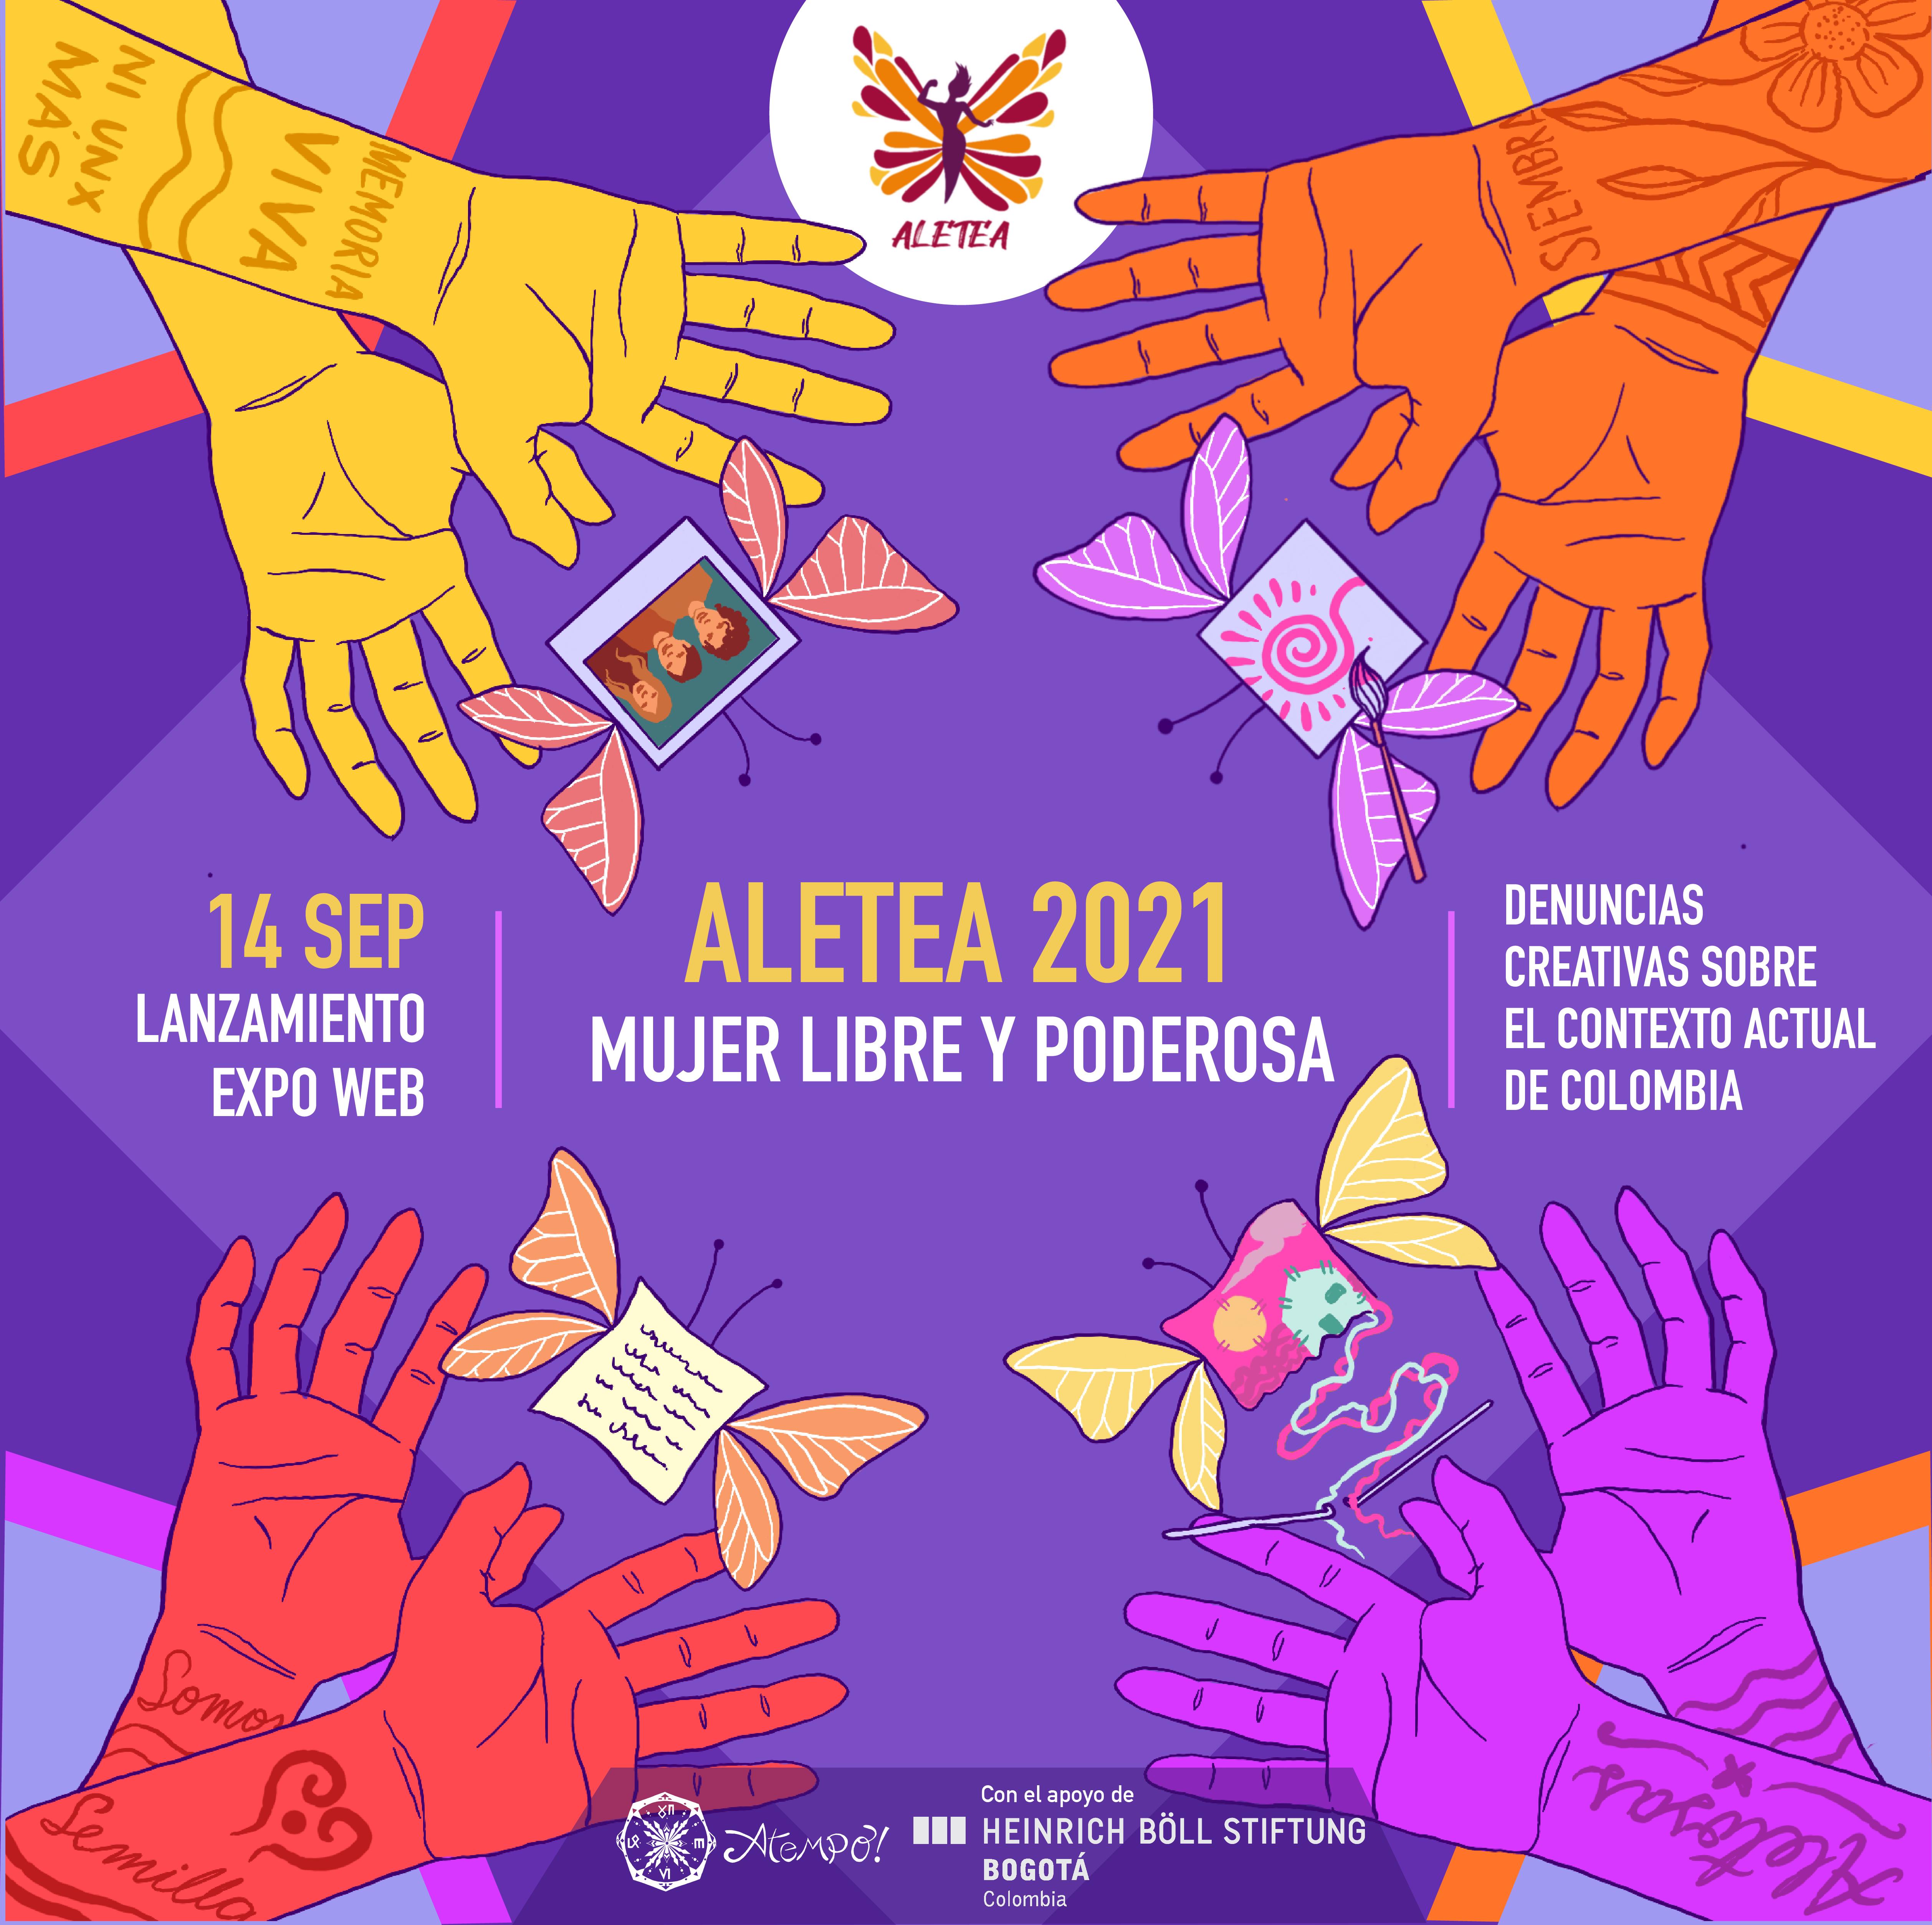 exposicion_web_-_aletea_2021.png